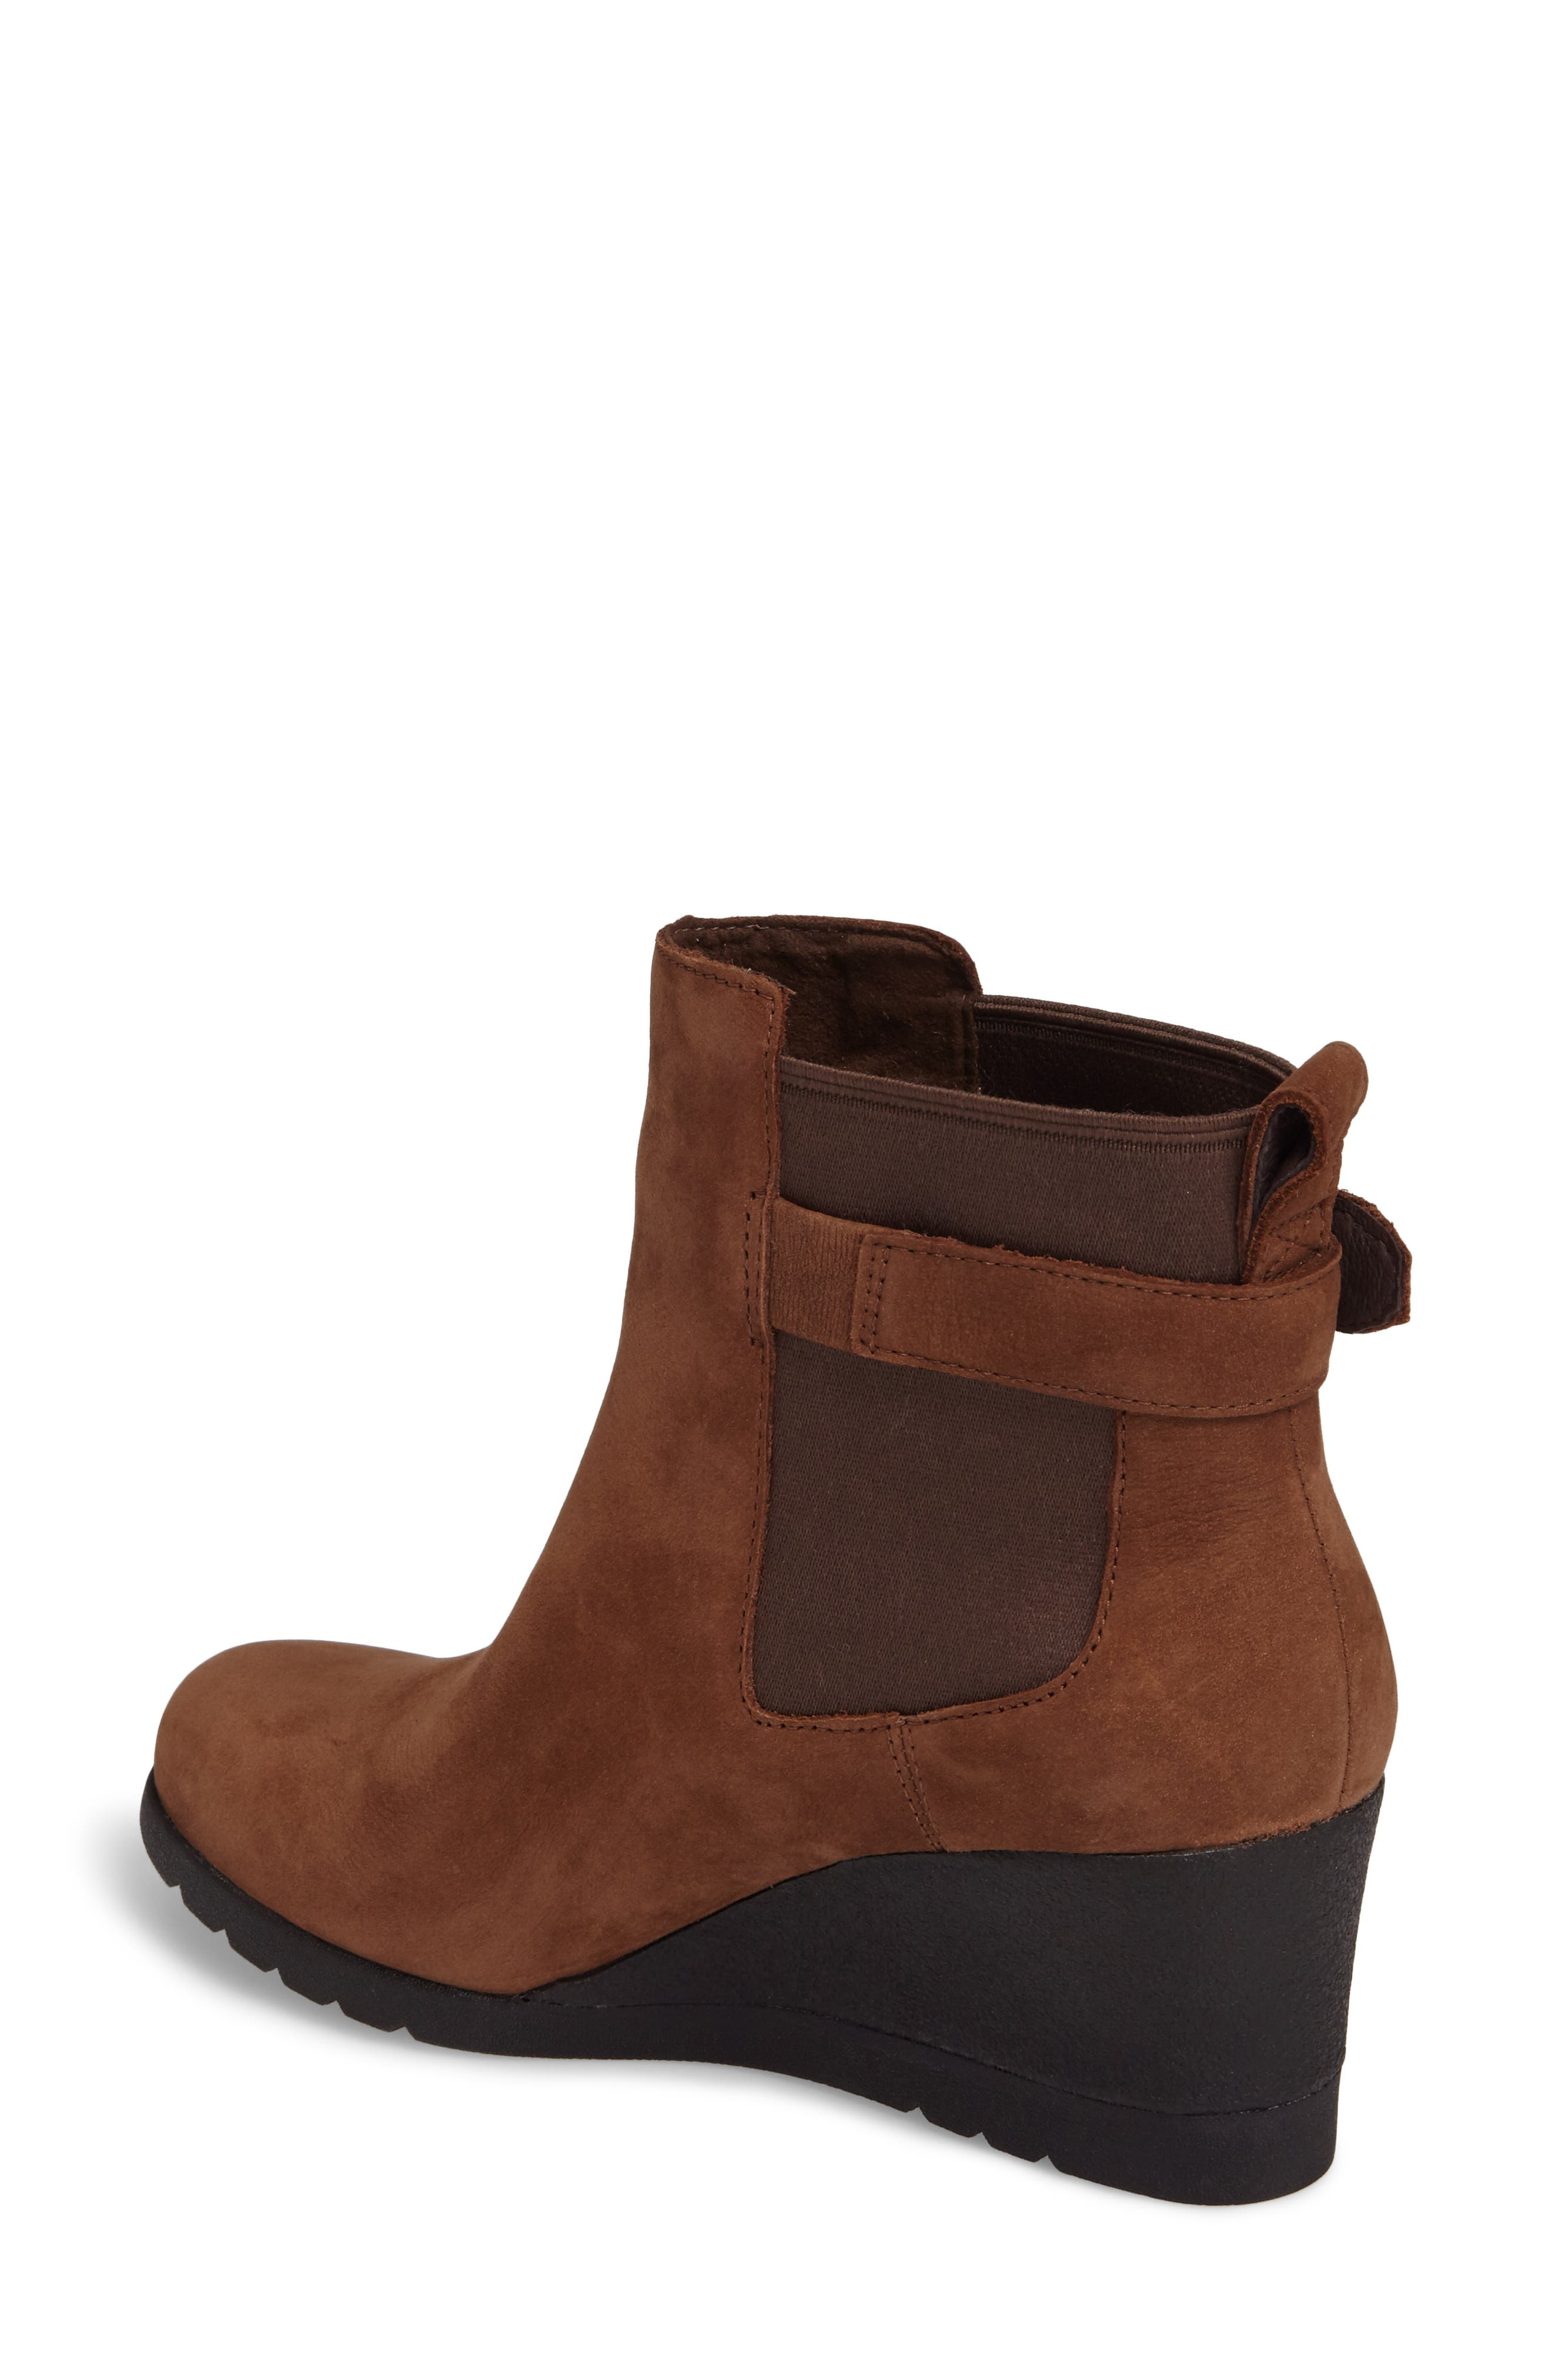 Alternate Image 2  - UGG® Waterproof Insulated Wedge Boot (Women)